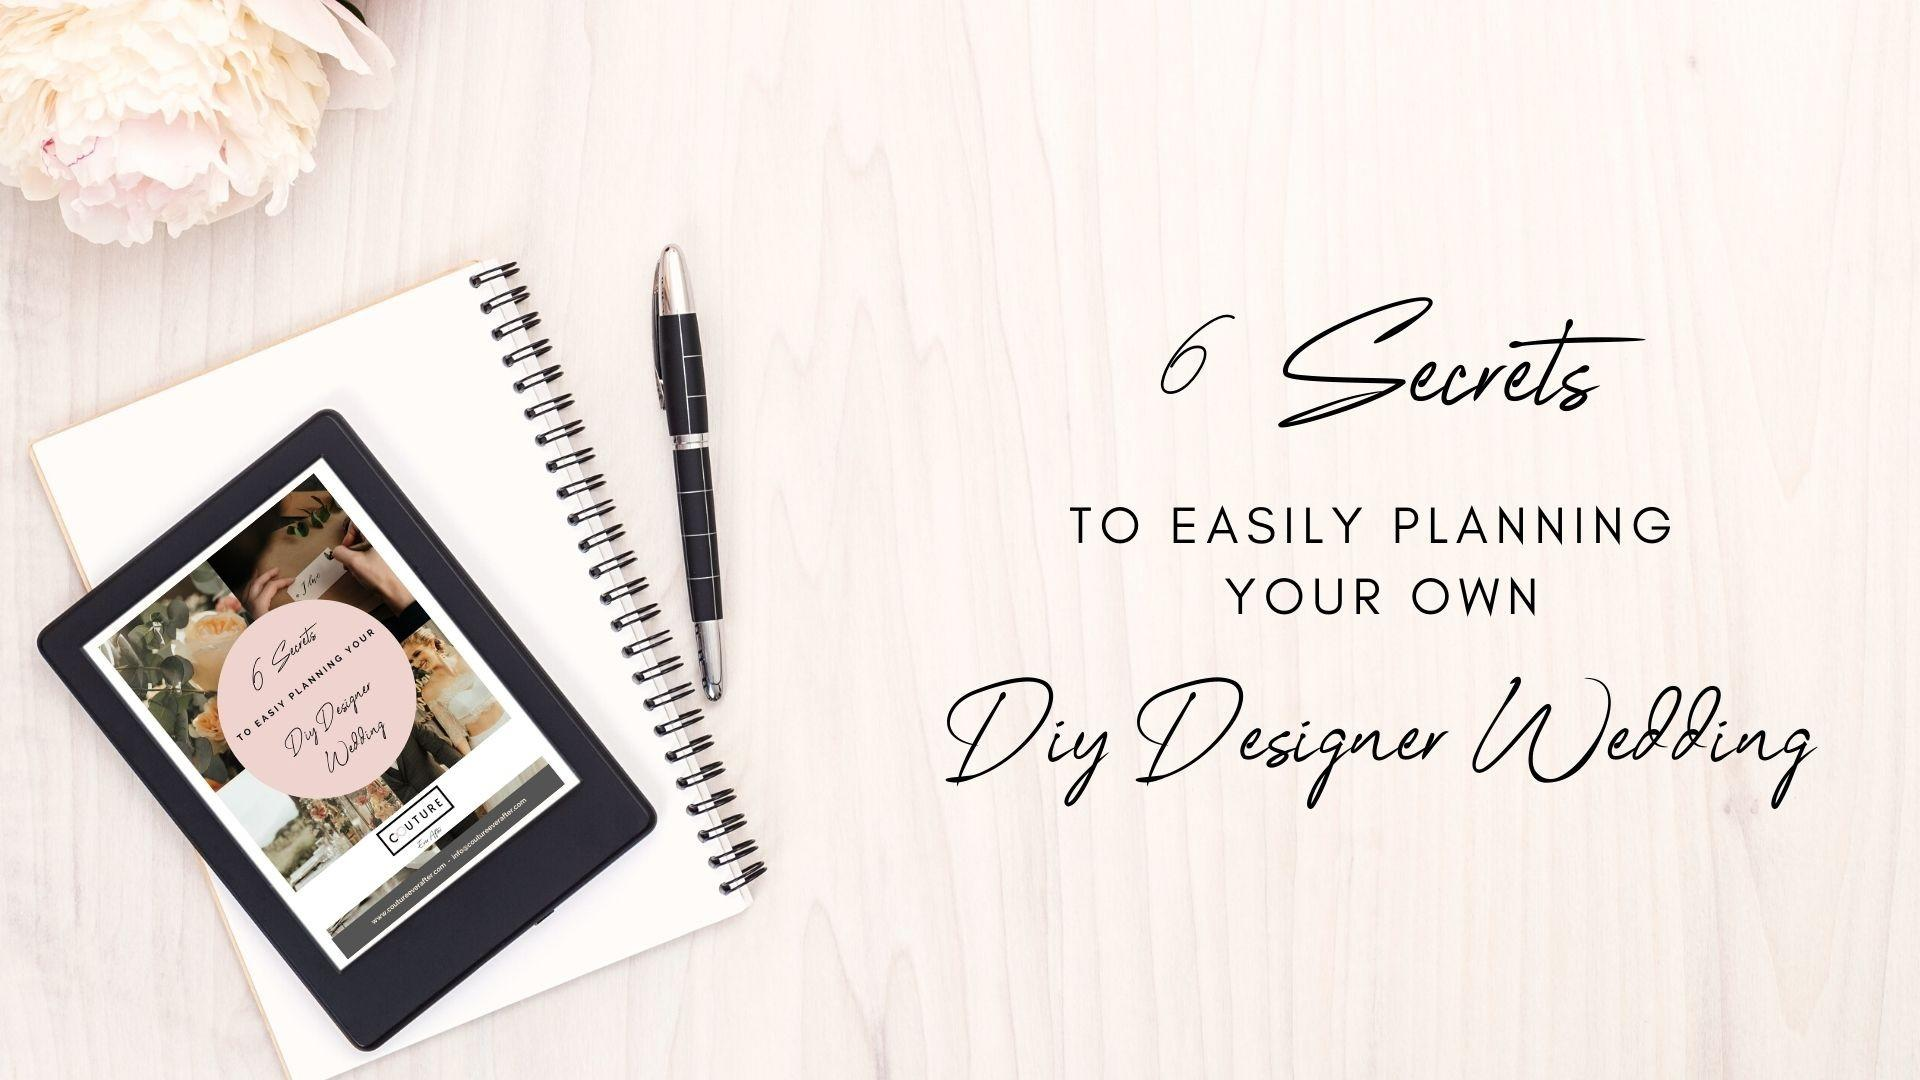 6 secrets to easily planning your own DIY Designer Wedding